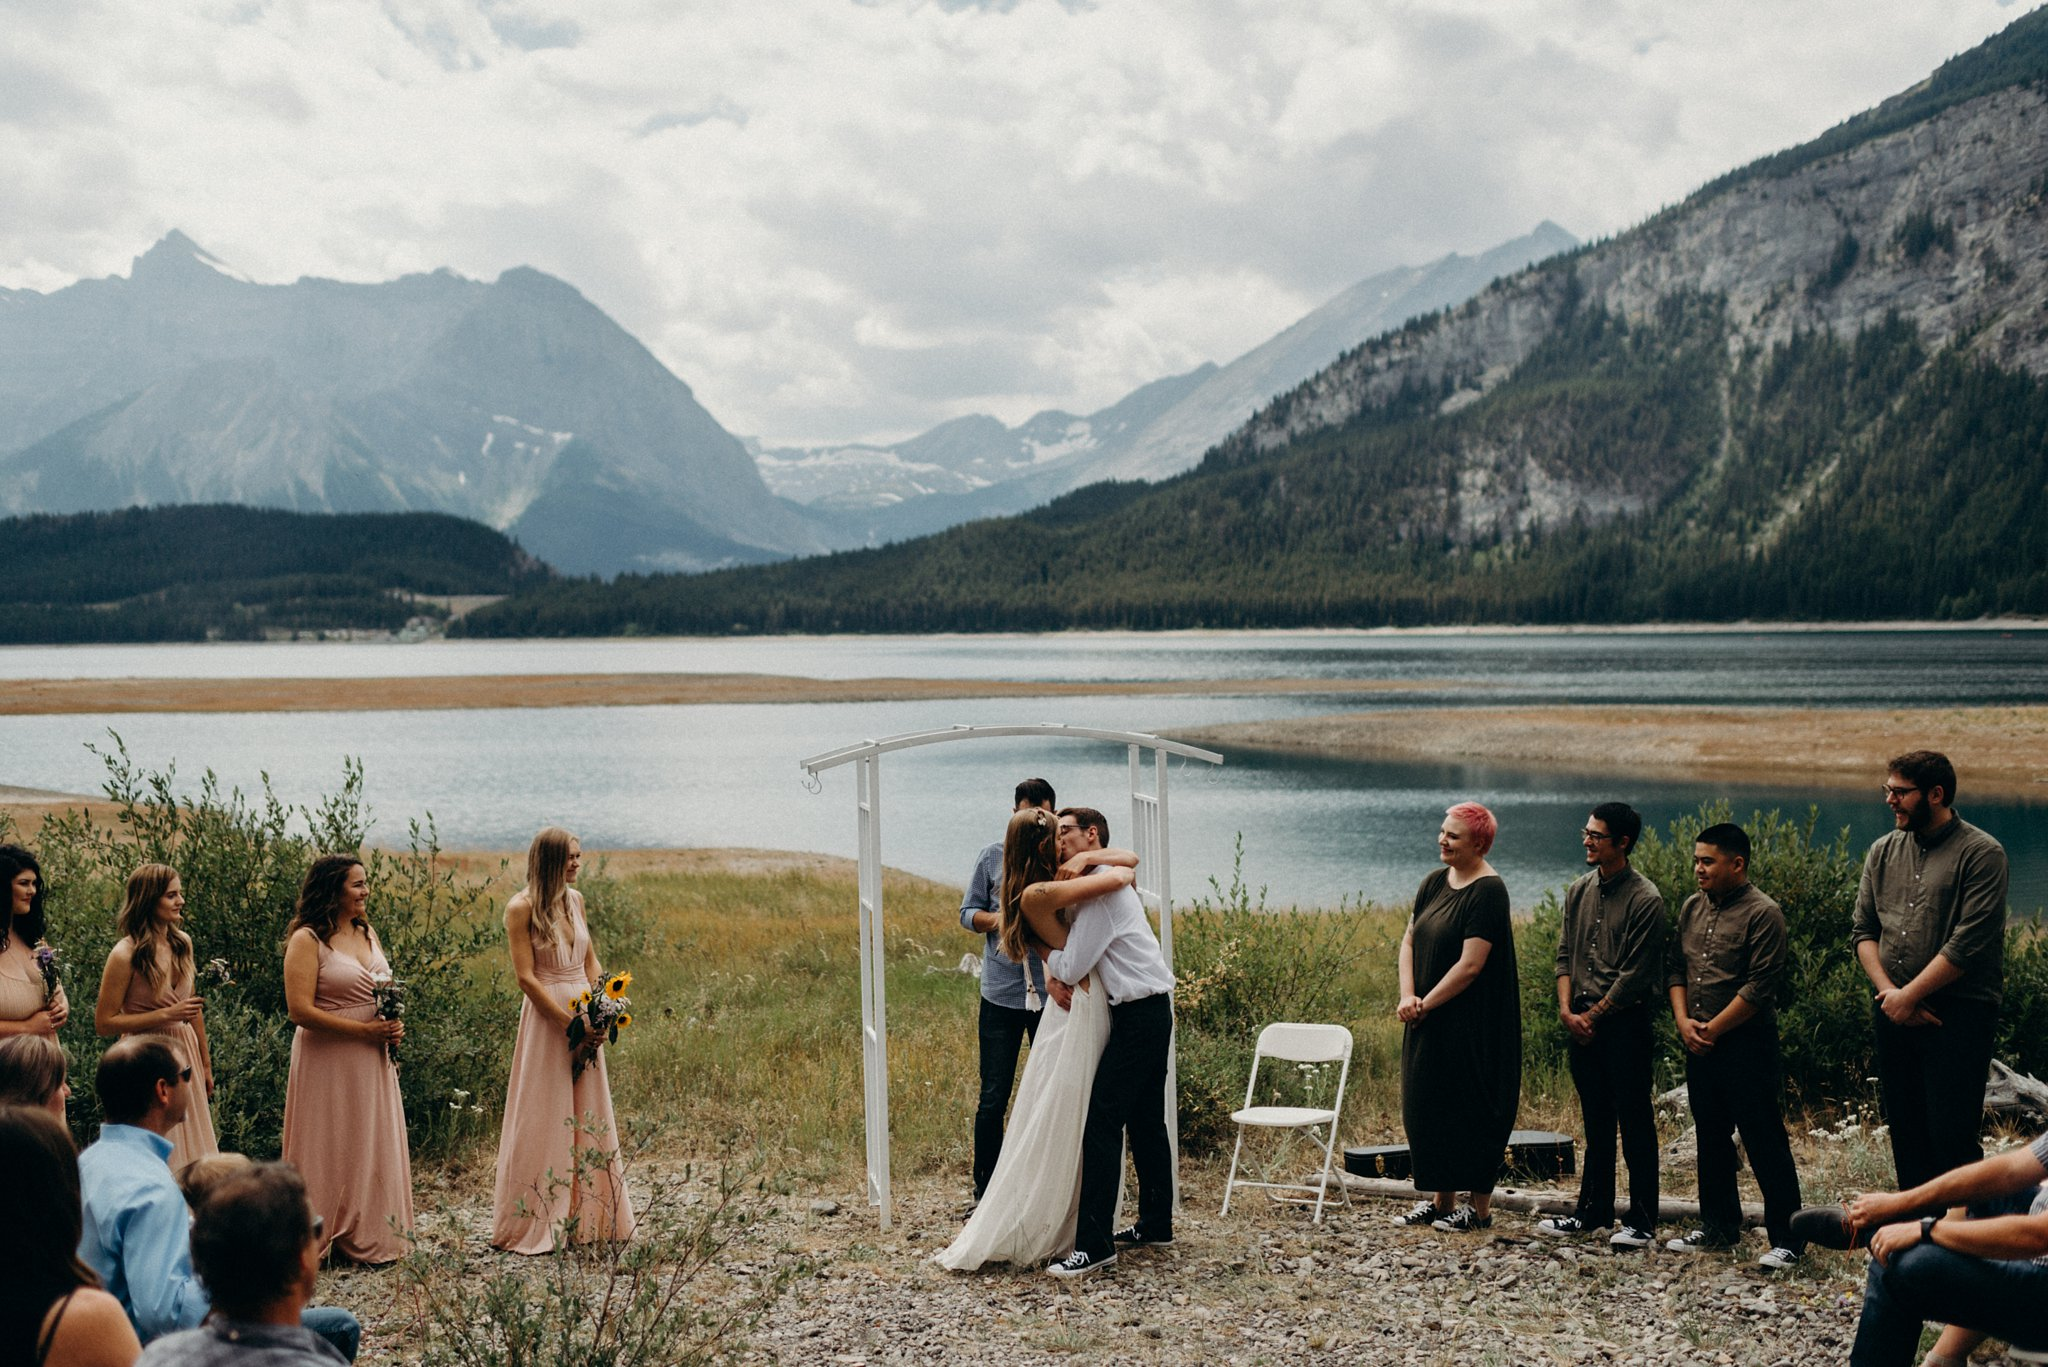 kaihla_tonai_intimate_wedding_elopement_photographer_6379.jpg